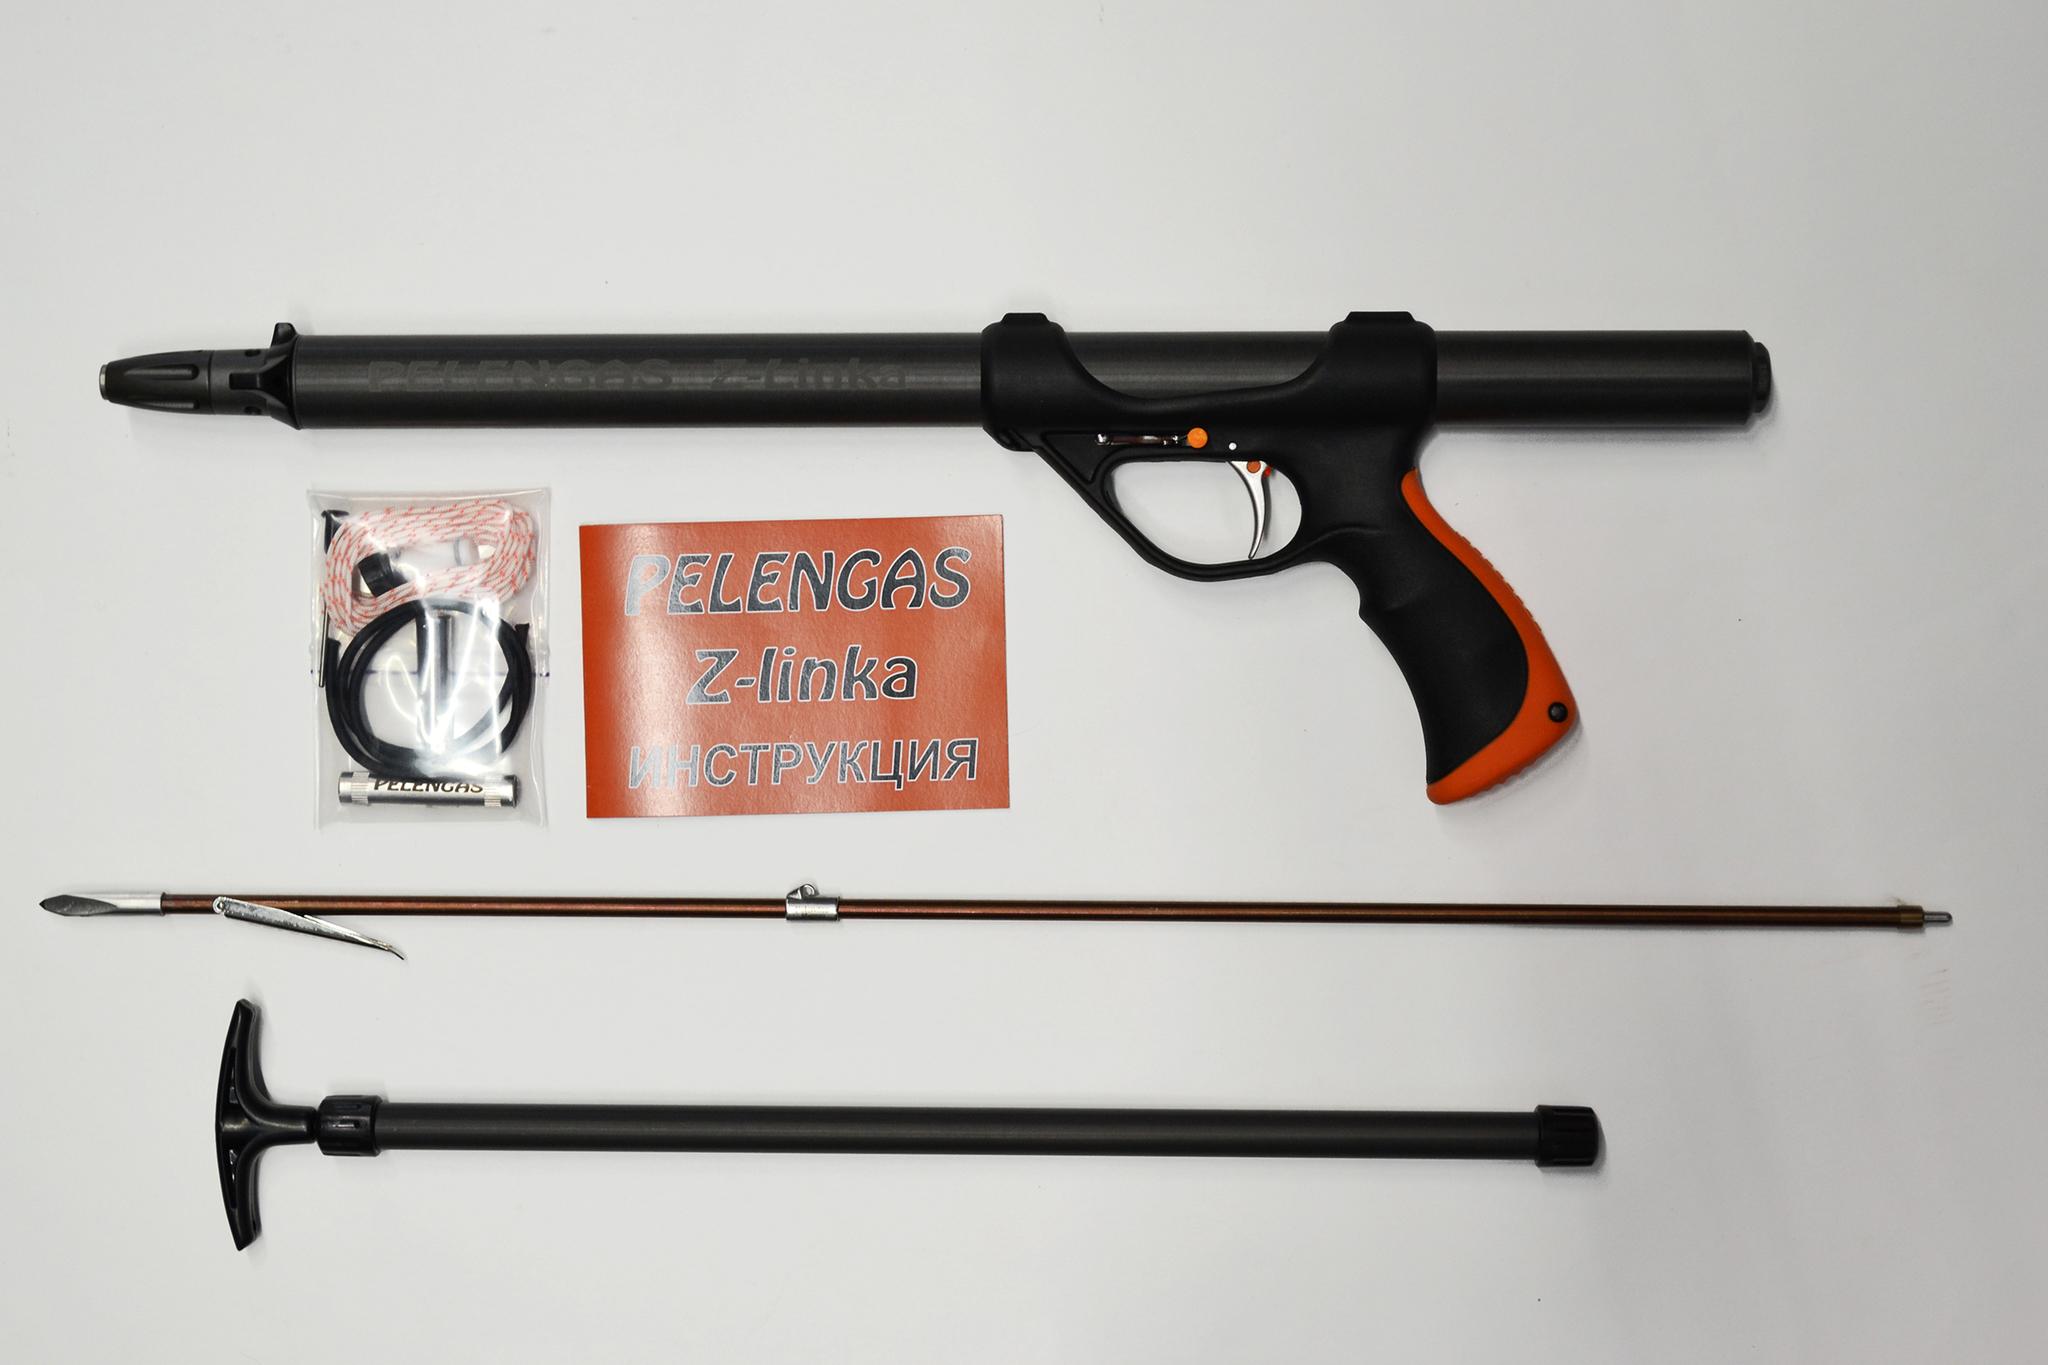 Ружье Pelengas Z-linka 55